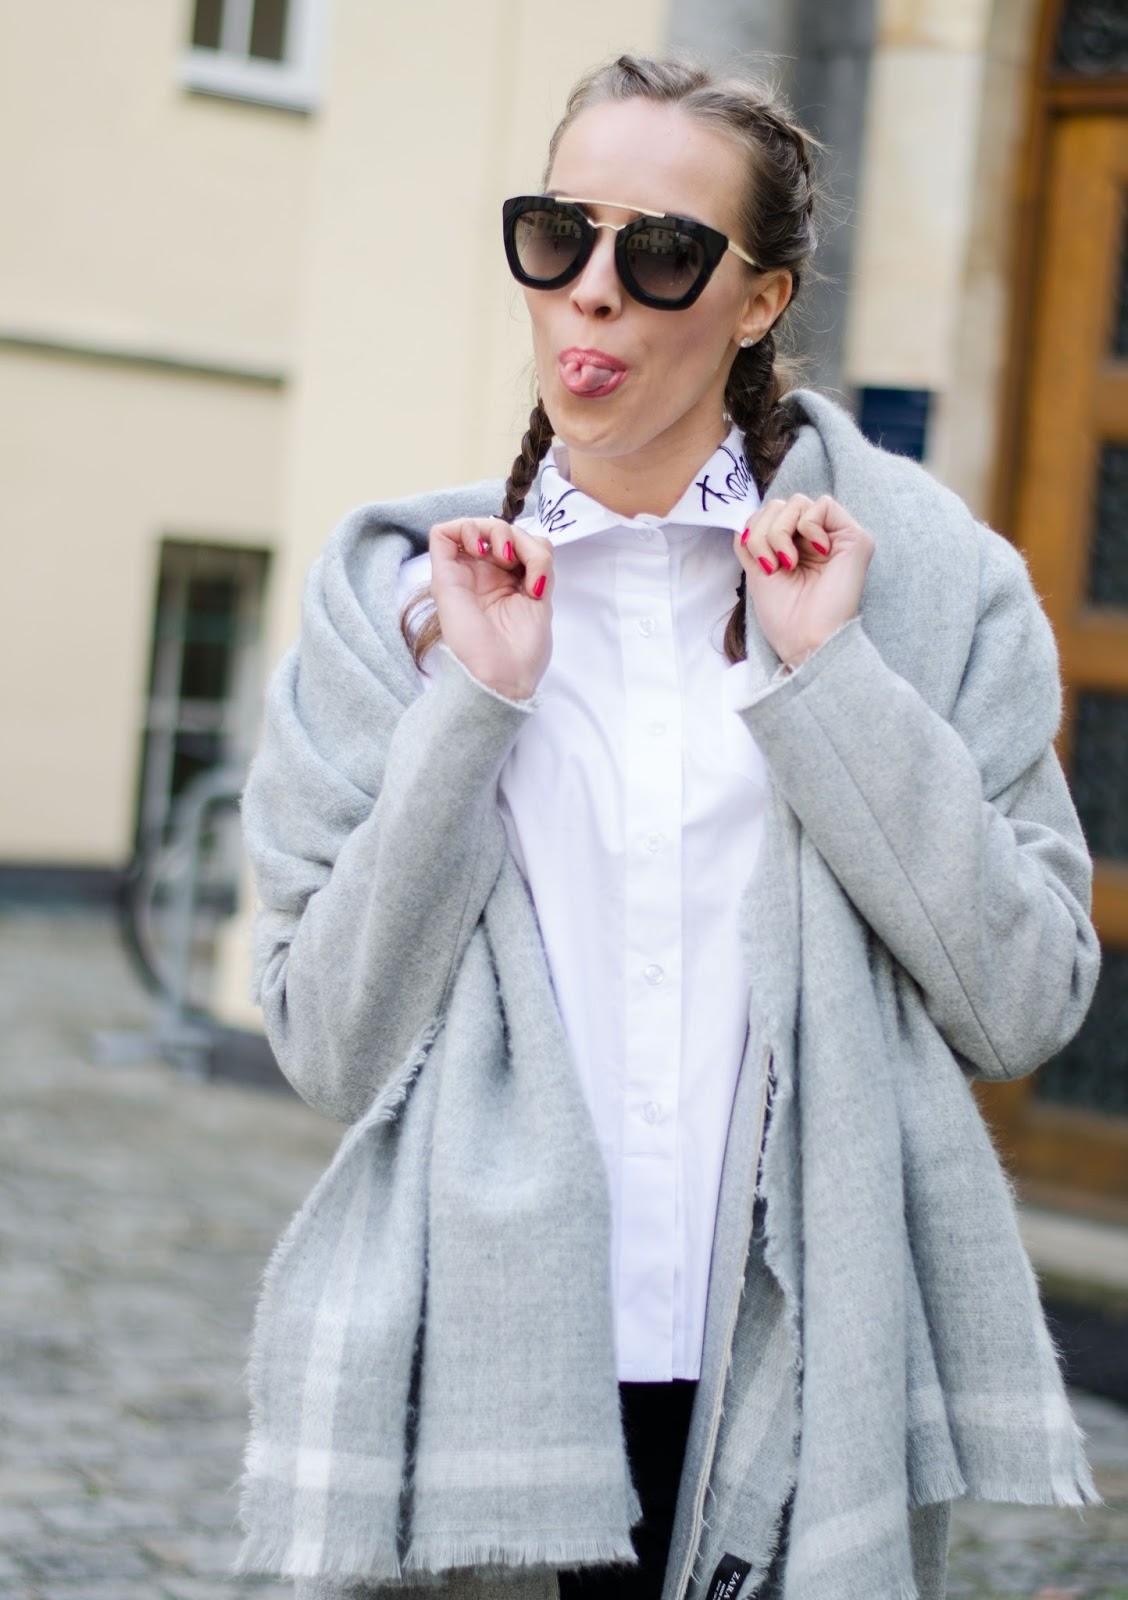 kristjaana mere french braids white collar shirt with text